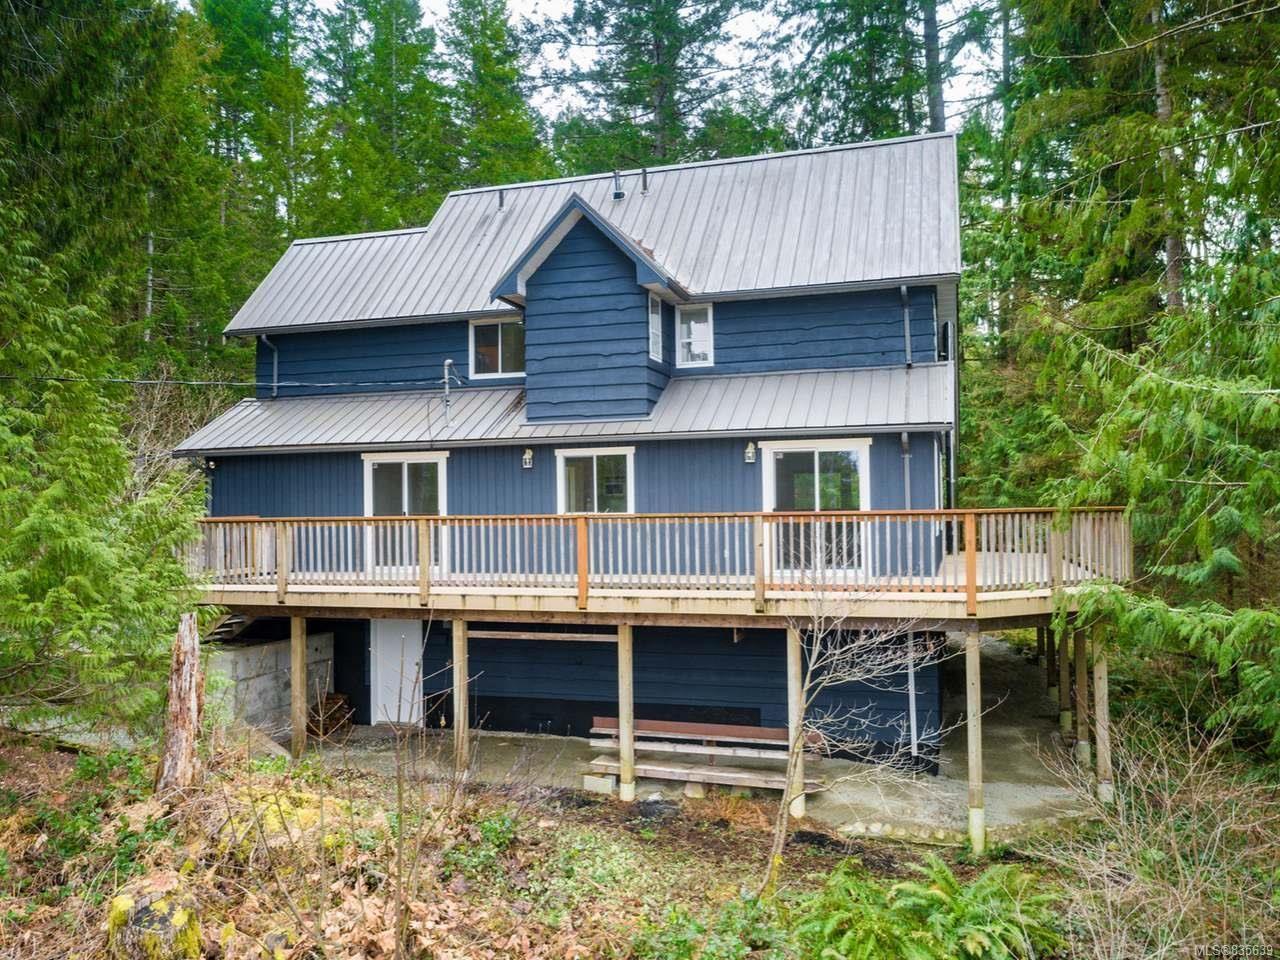 Photo 60: Photos: 9657 Faber Rd in PORT ALBERNI: PA Sproat Lake House for sale (Port Alberni)  : MLS®# 835639